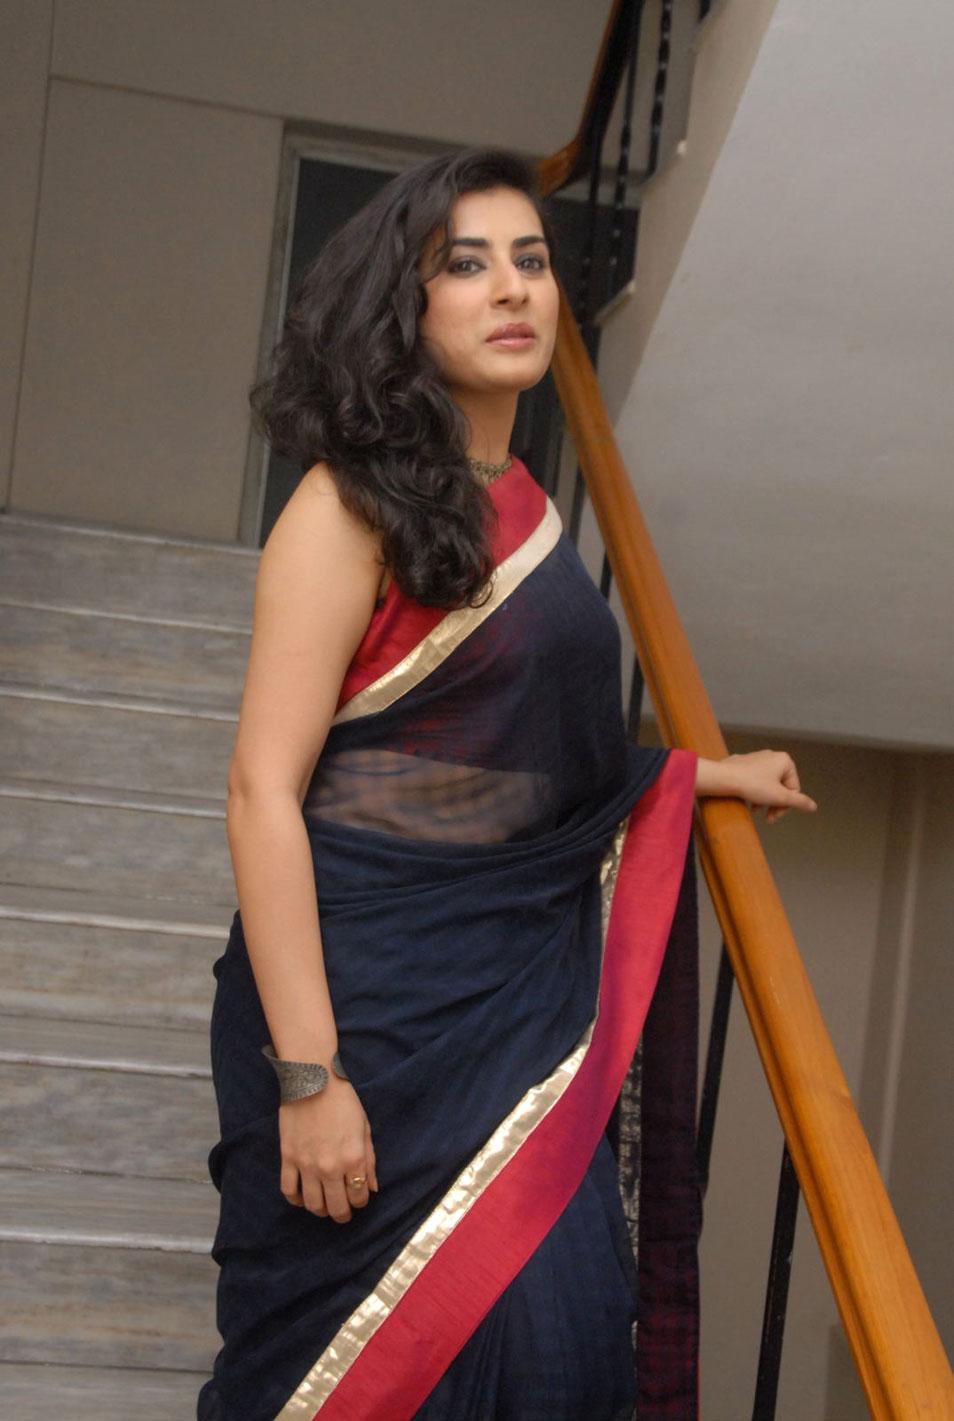 a9c949d046db53 Veda archana sastry full backless bikini blouse black transparent saree  boobs side view cleavage jpg 954x1421